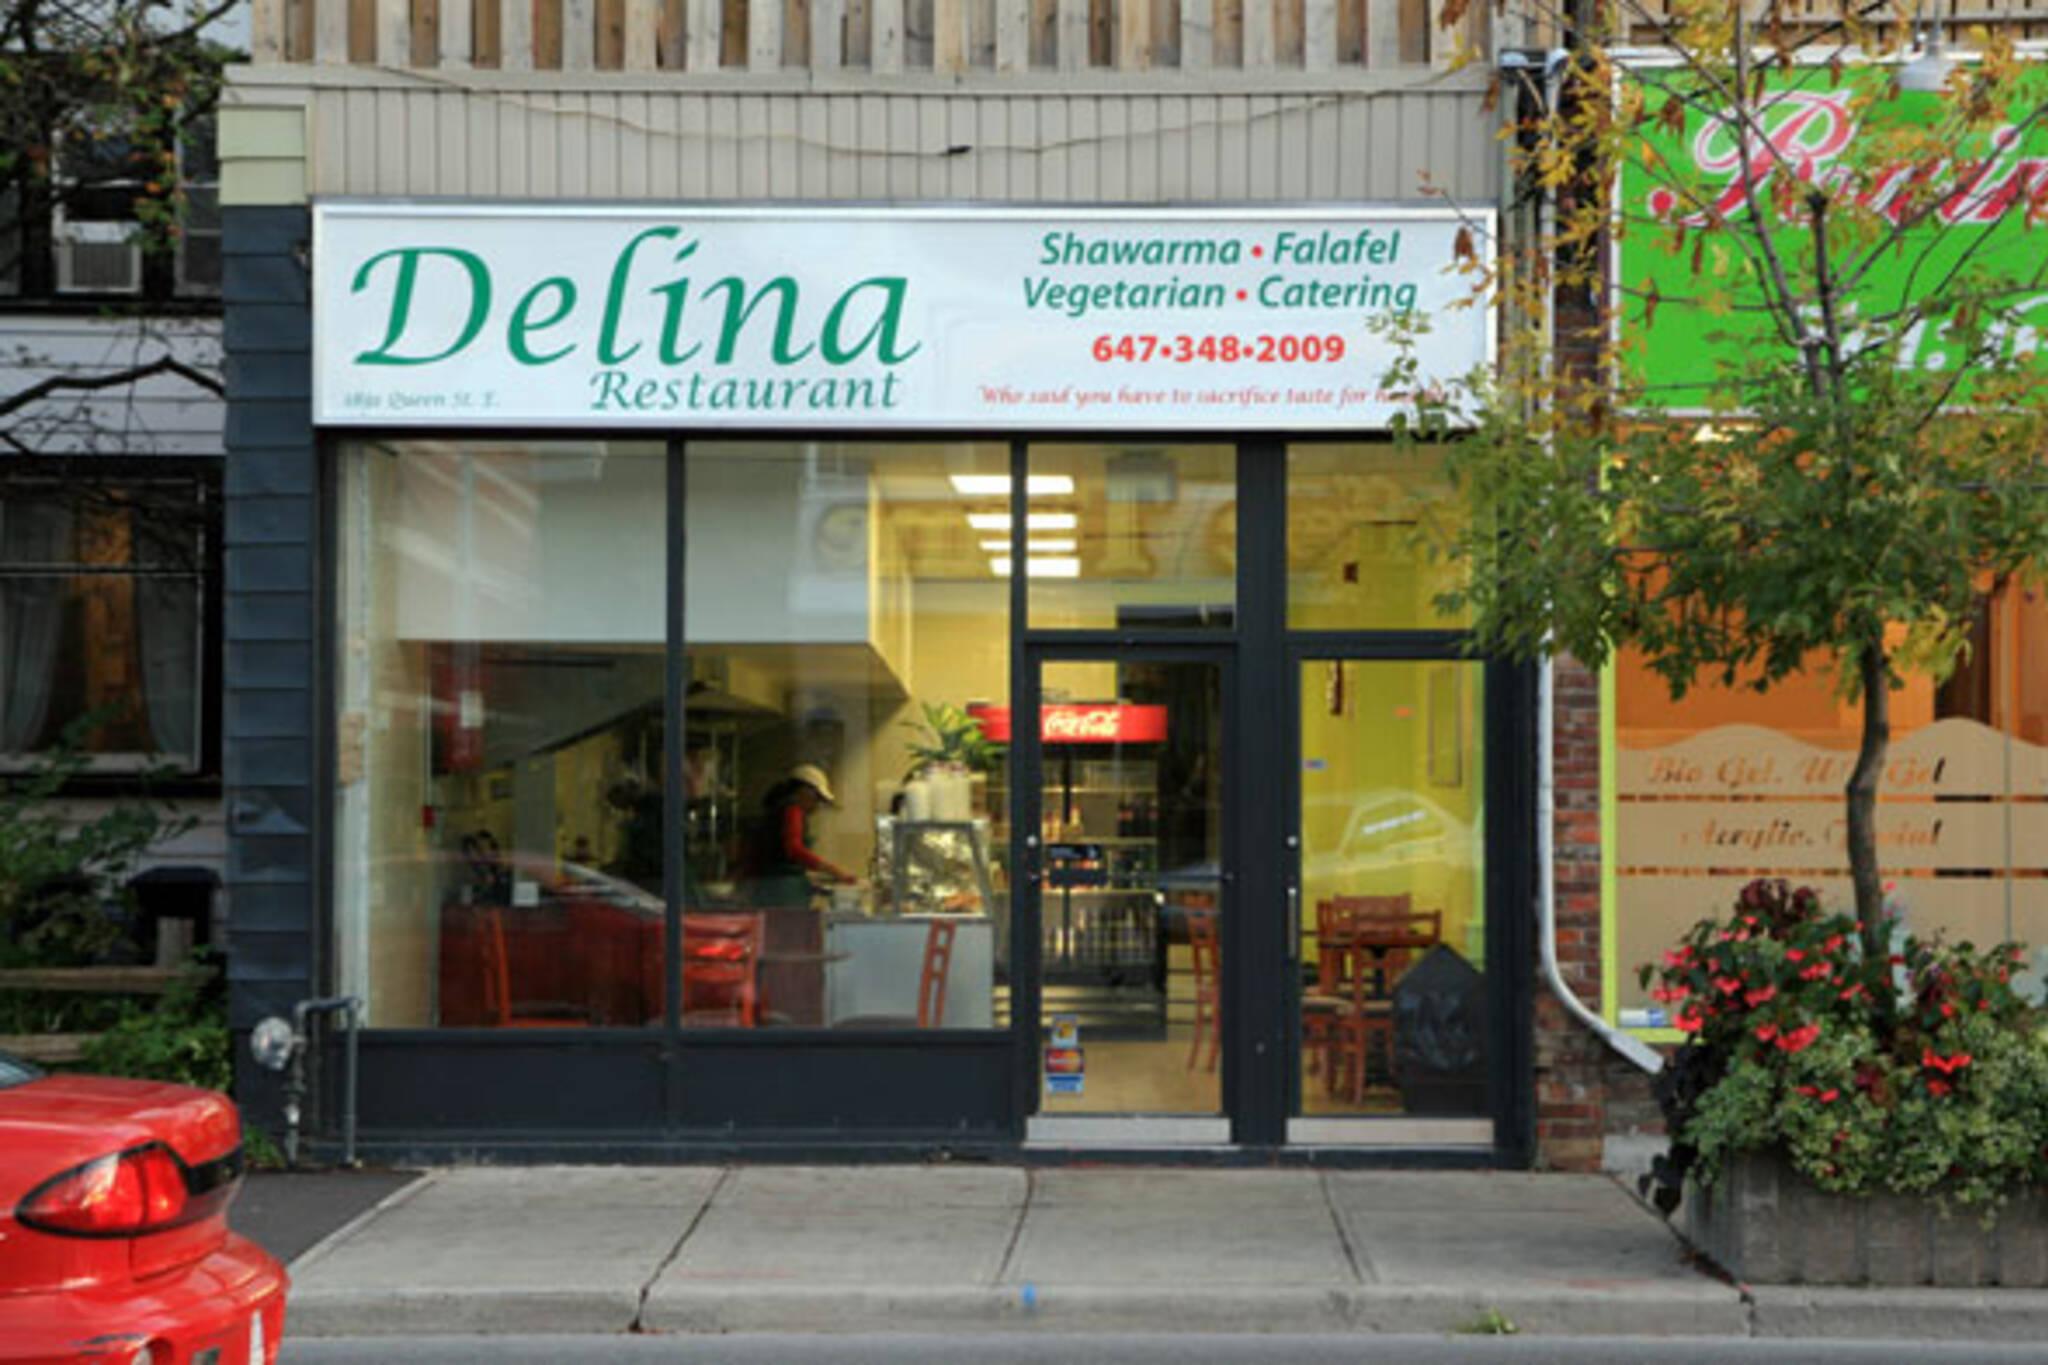 Delina Restaurant